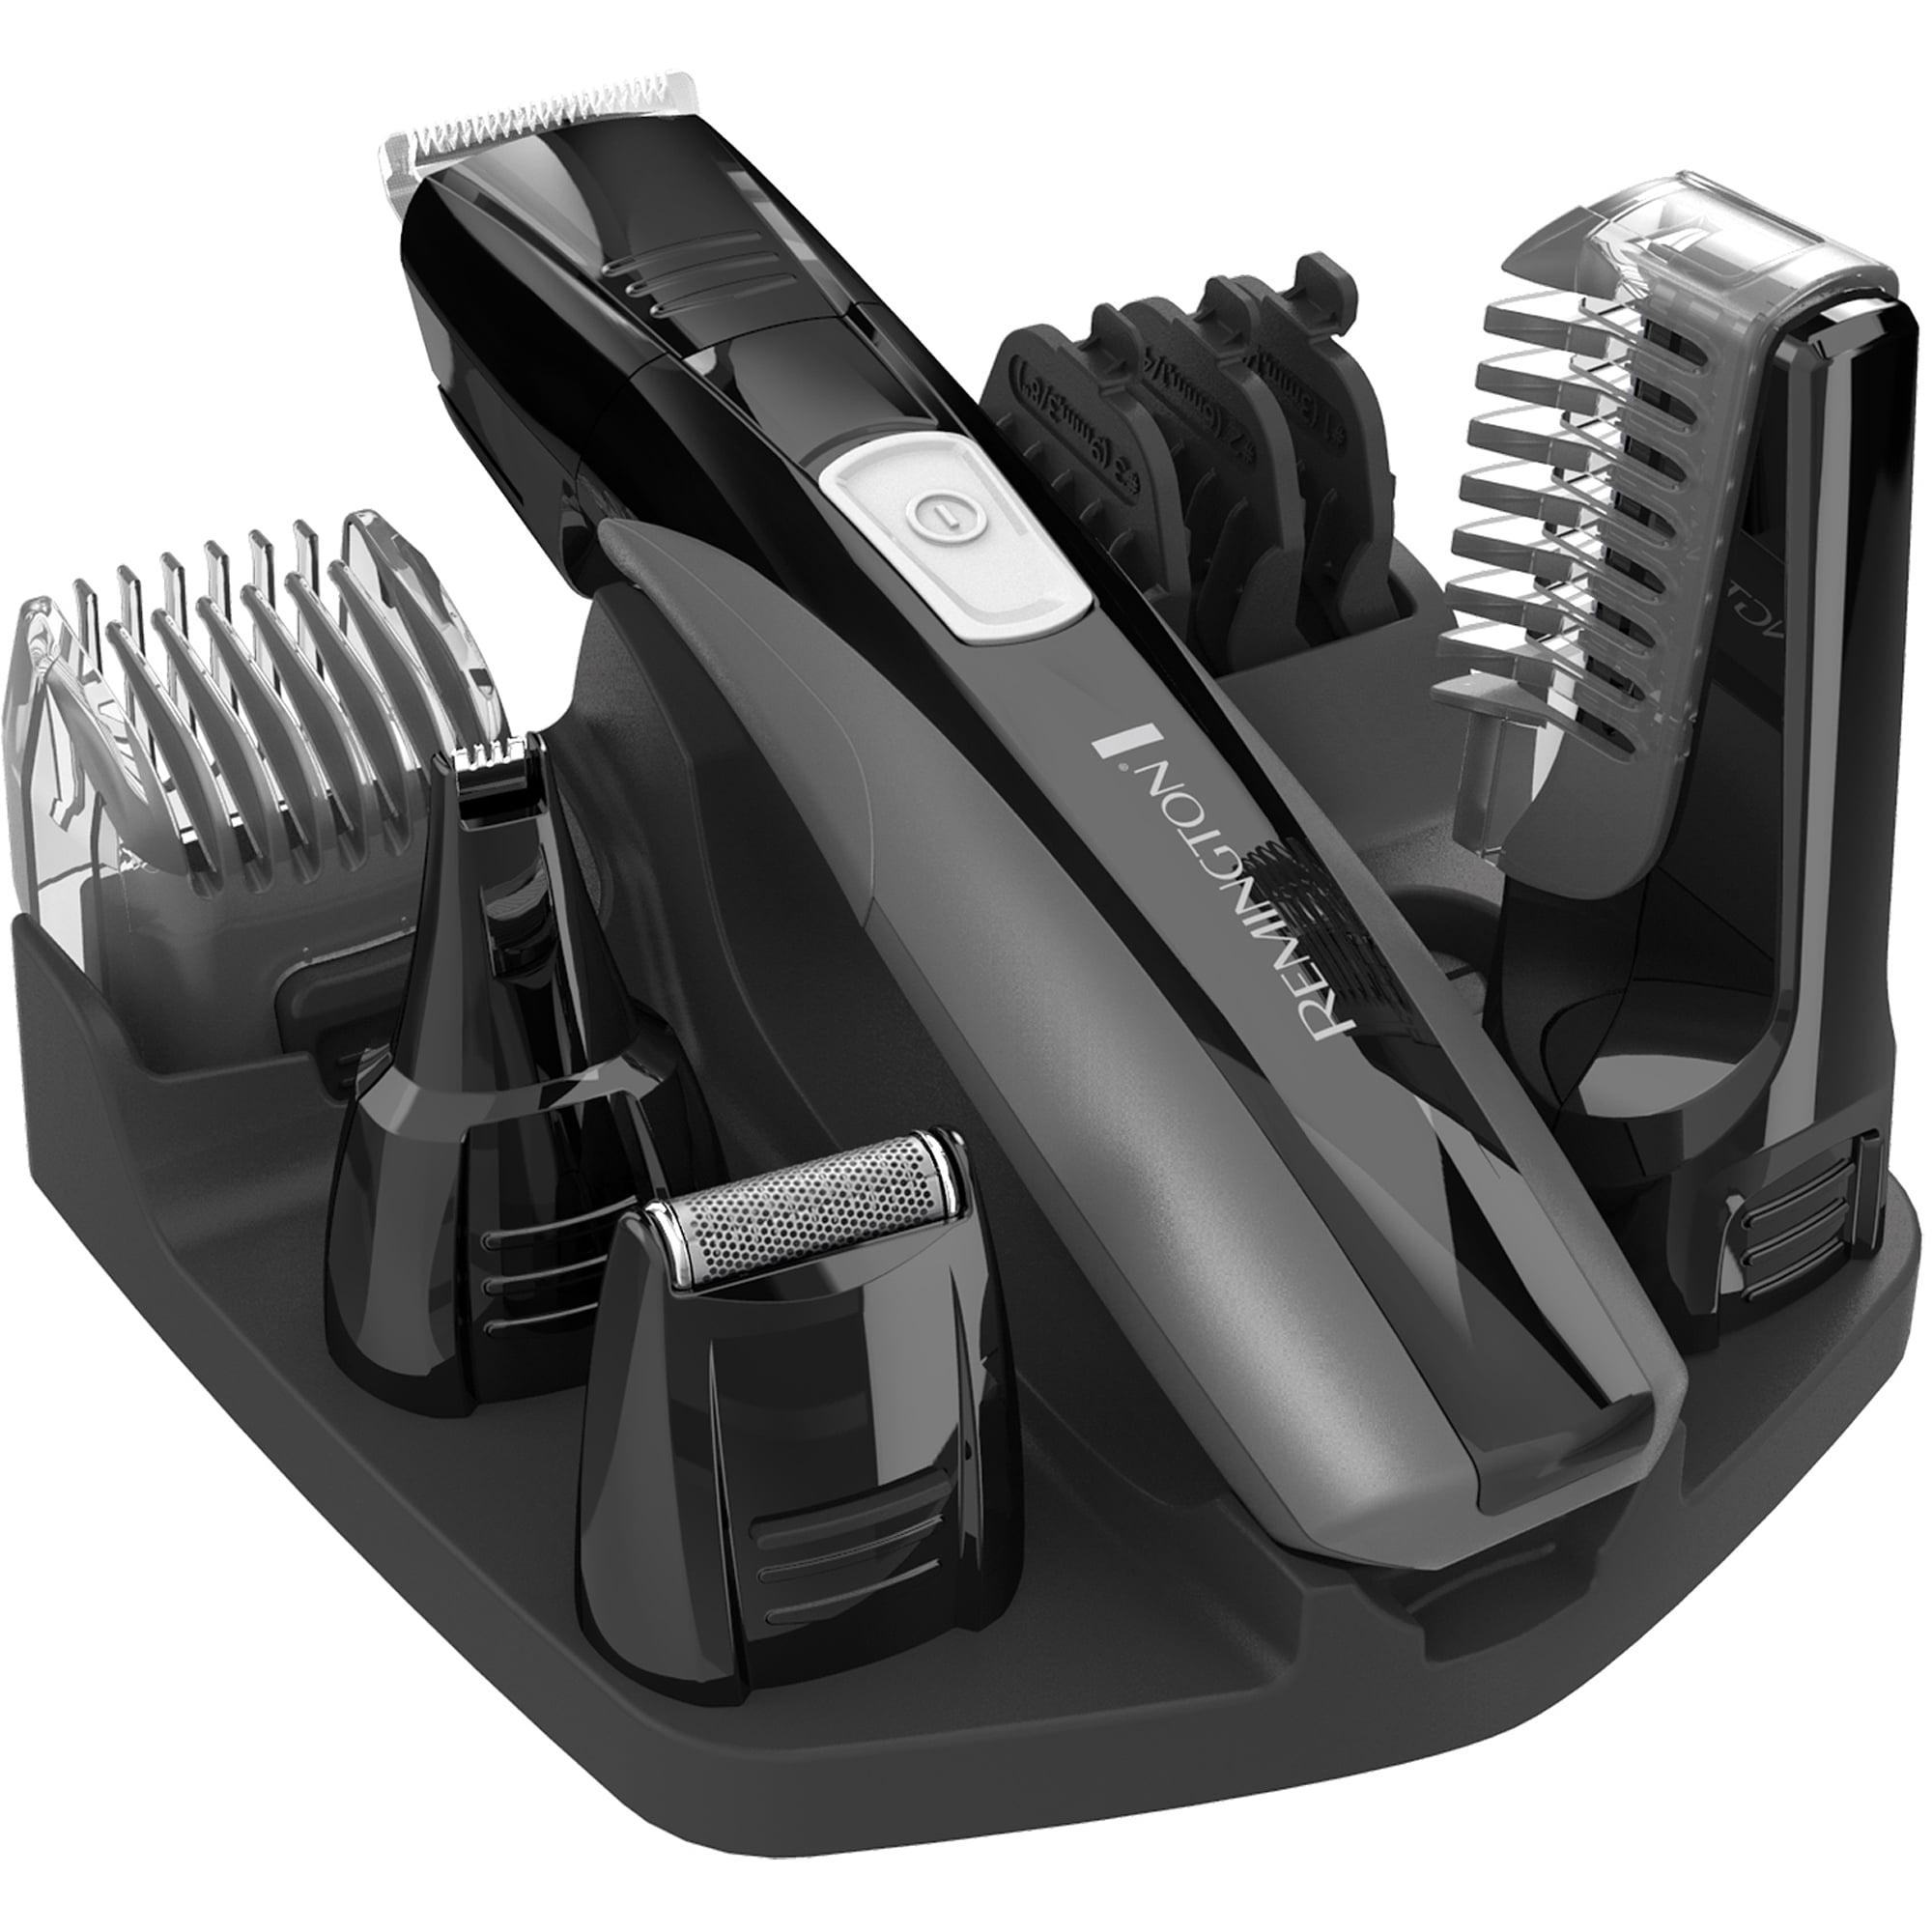 Remington Lithium Power Series Head-To-Toe Grooming Kit